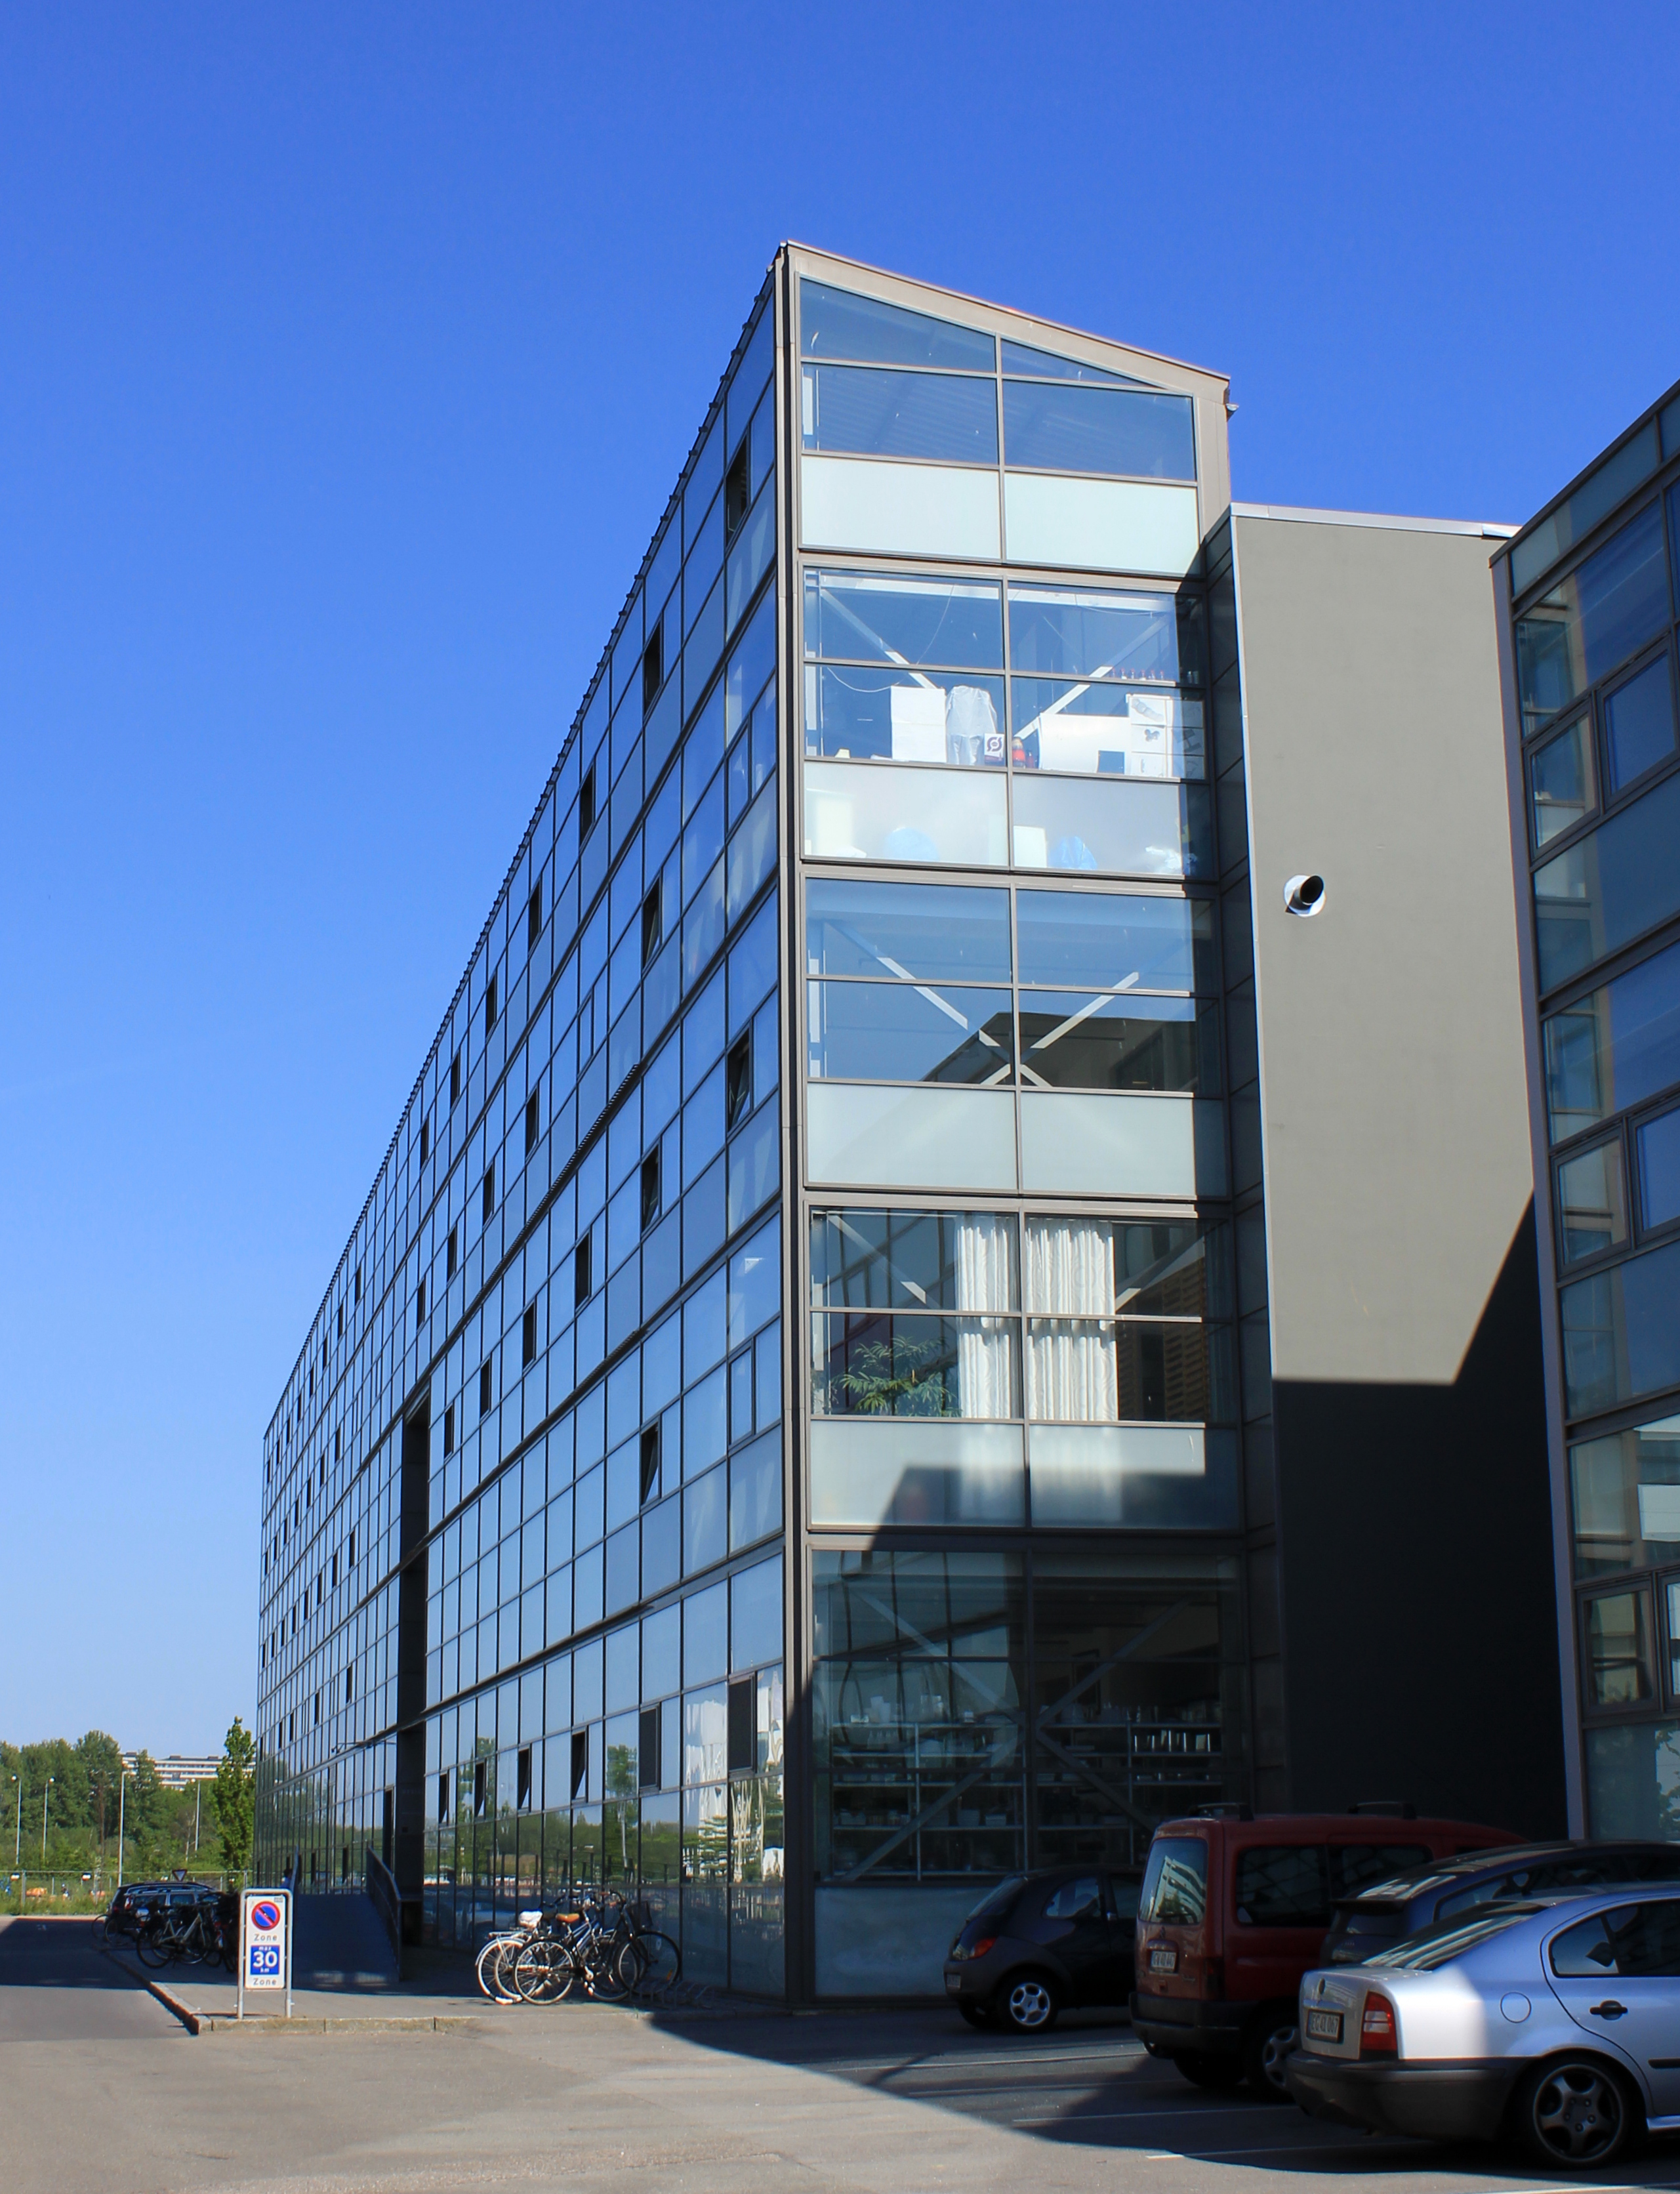 F%2fff%2fthe kolding school of design   designskolen kolding. denmark